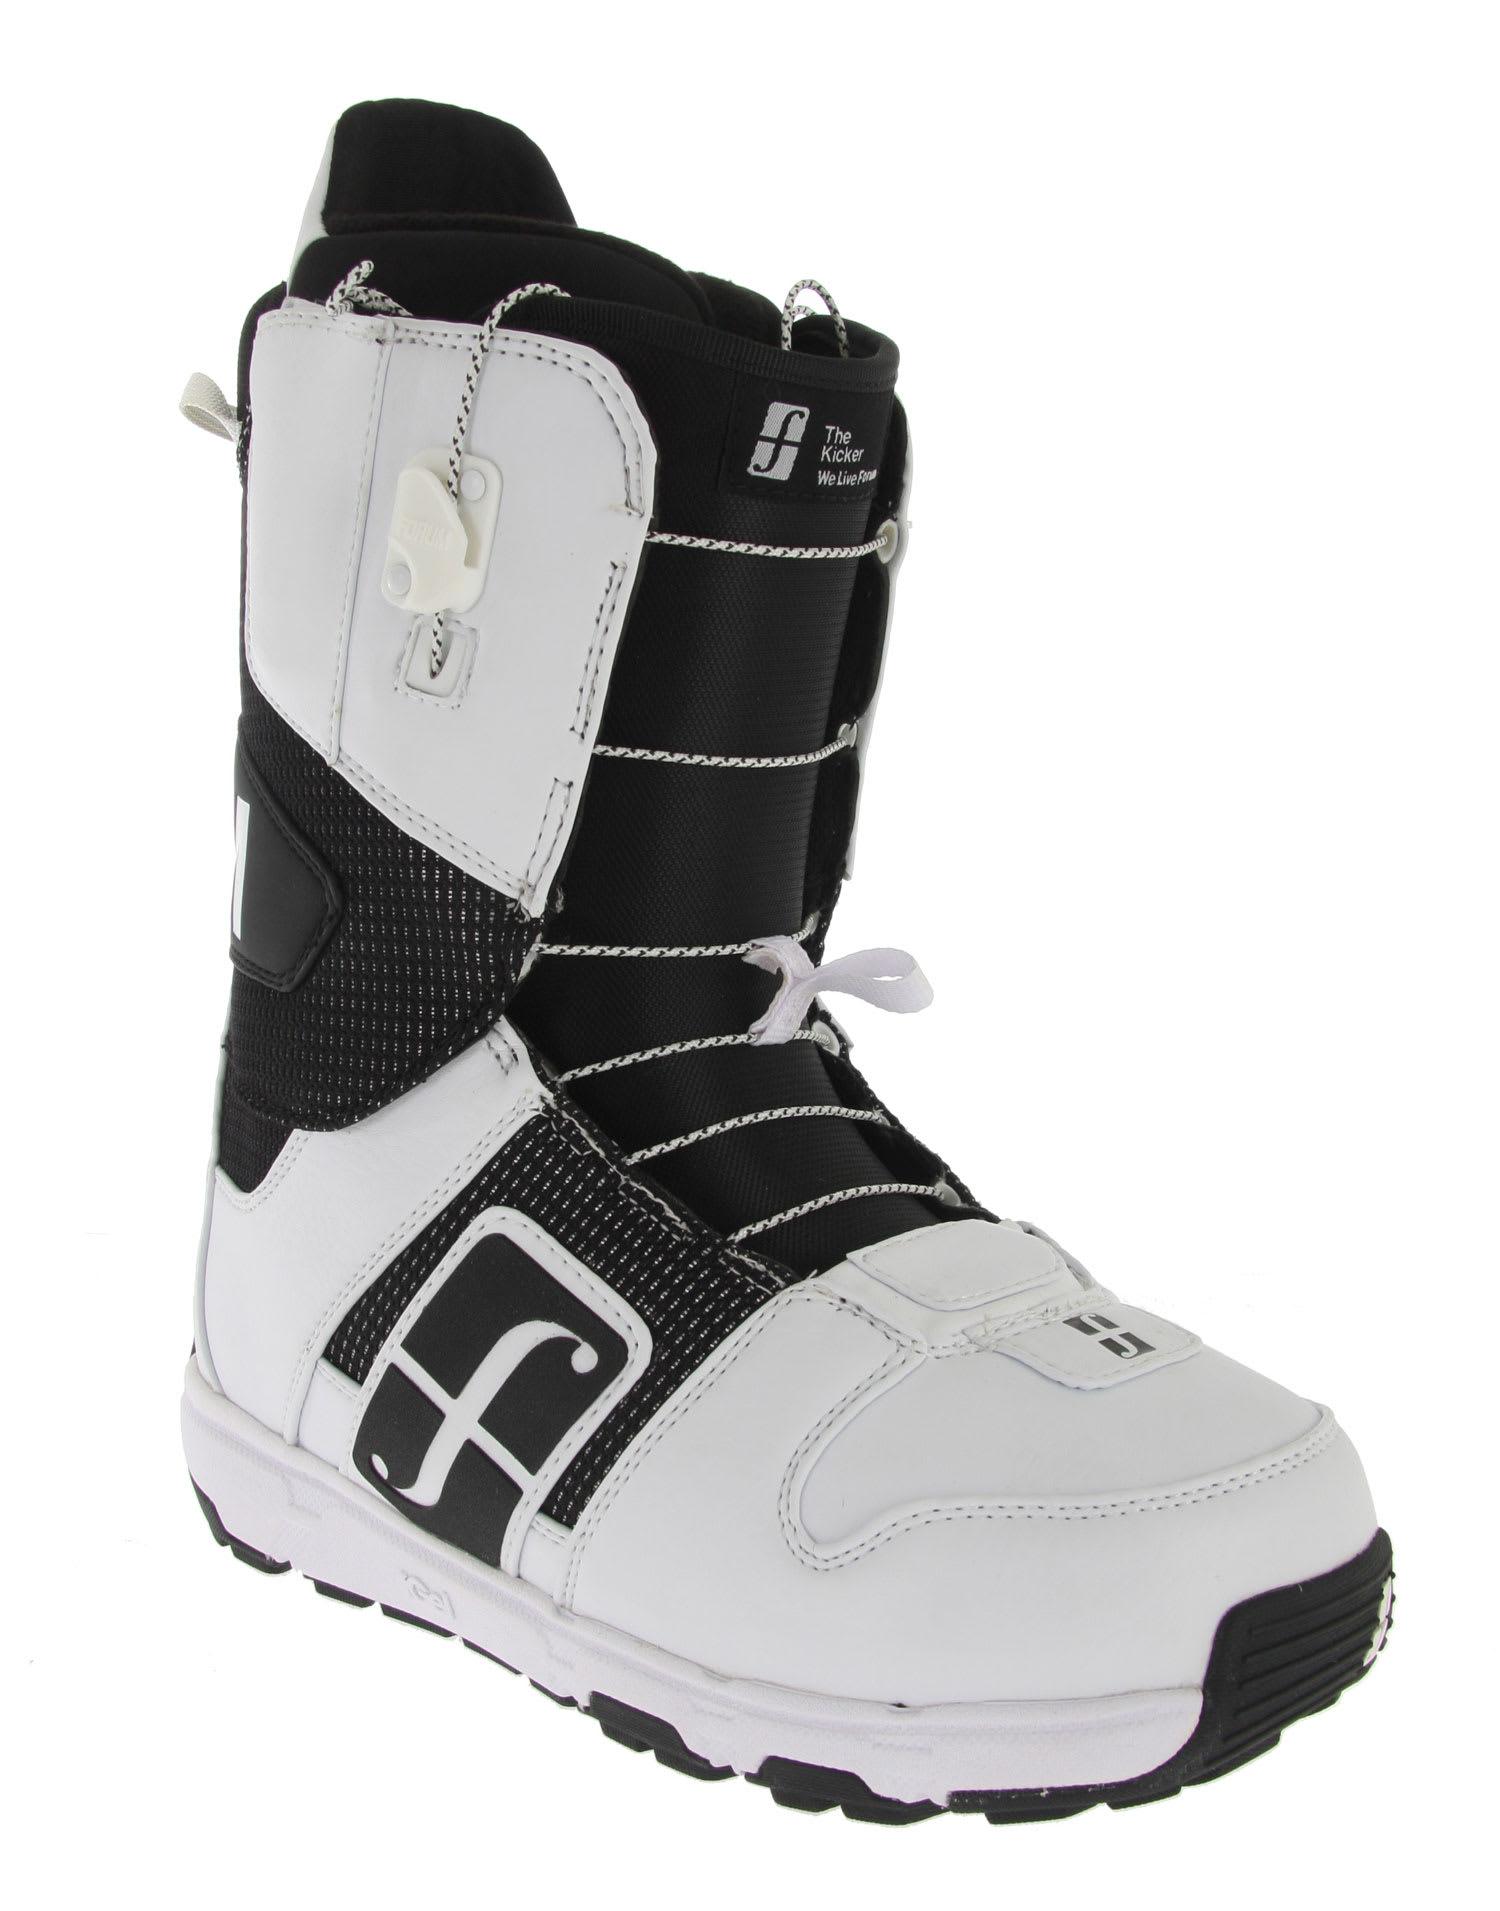 Forum Kicker Snowboard Boots |Snowboarding Kickers